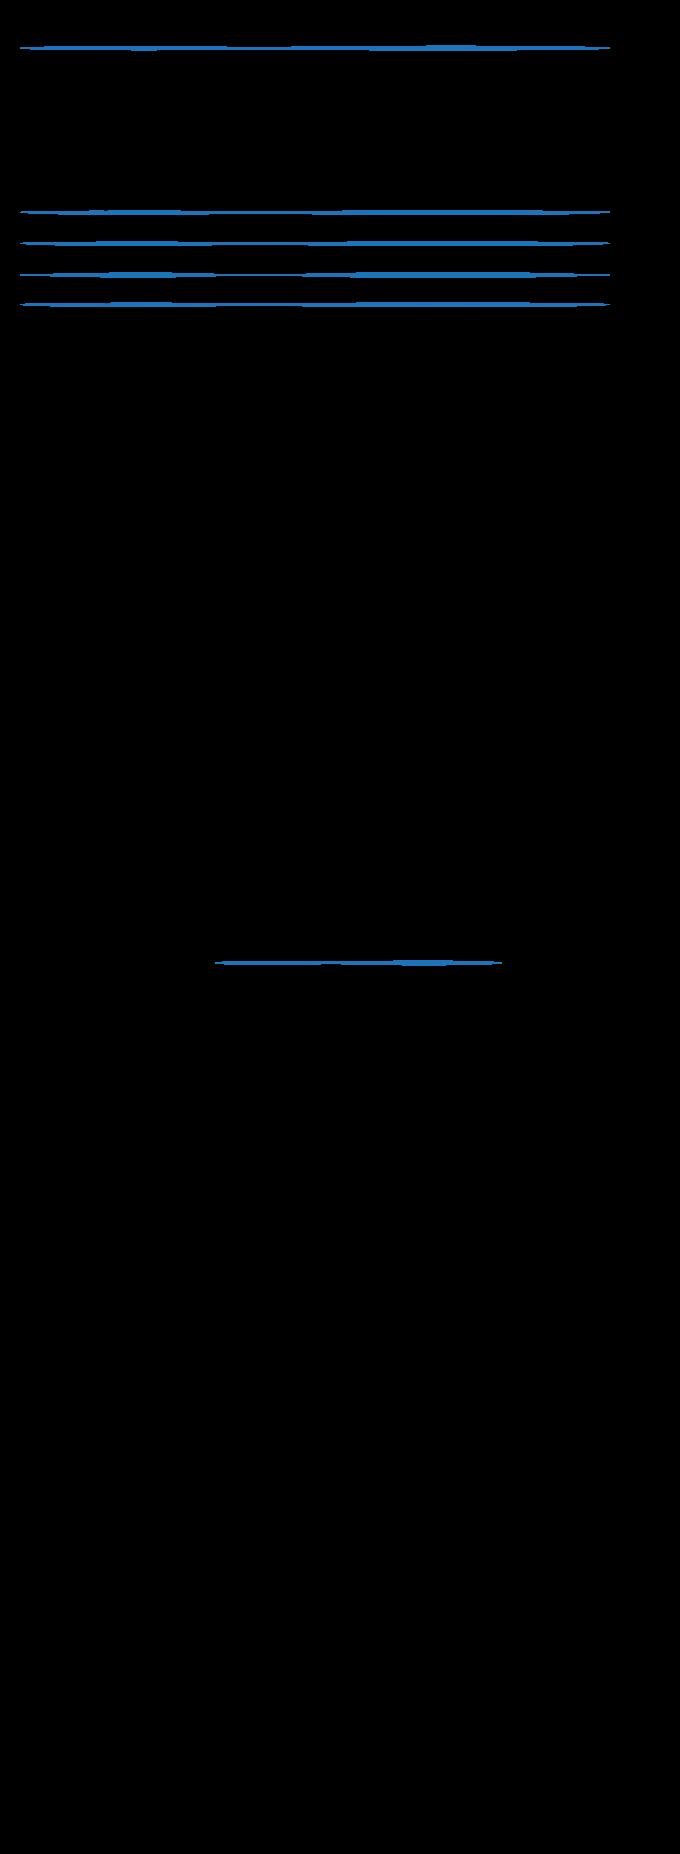 Text_Whg 3-01